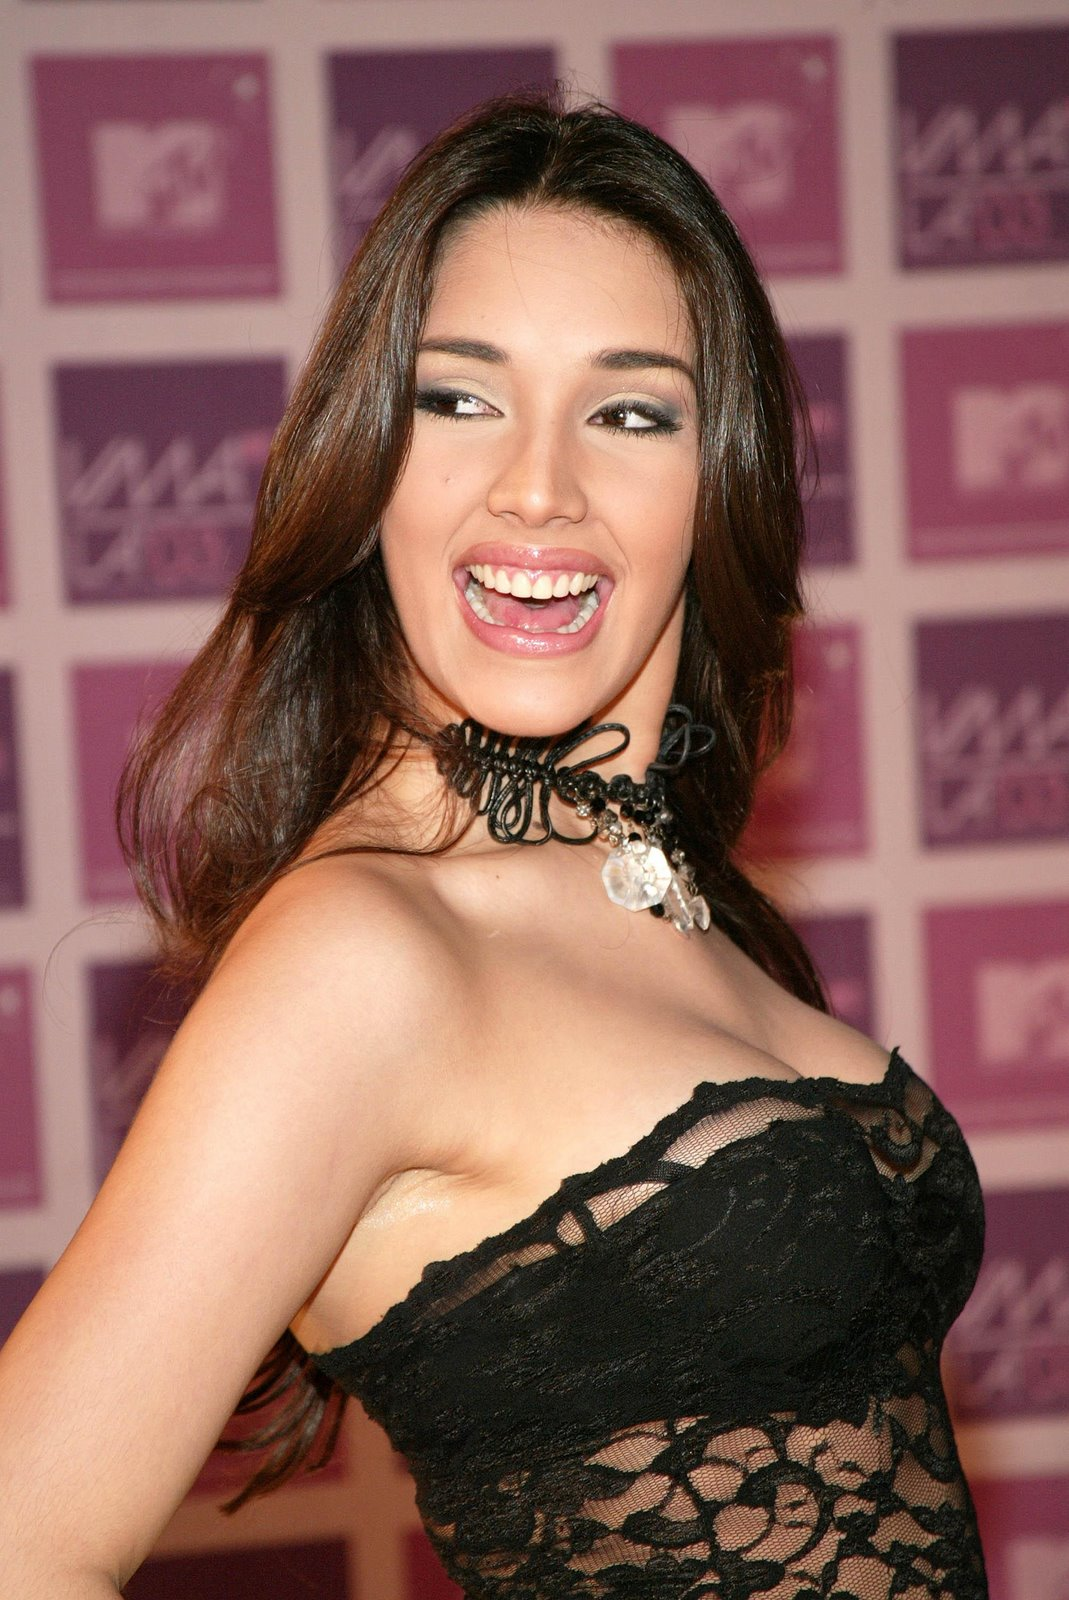 Amelia Vega sexiest photo